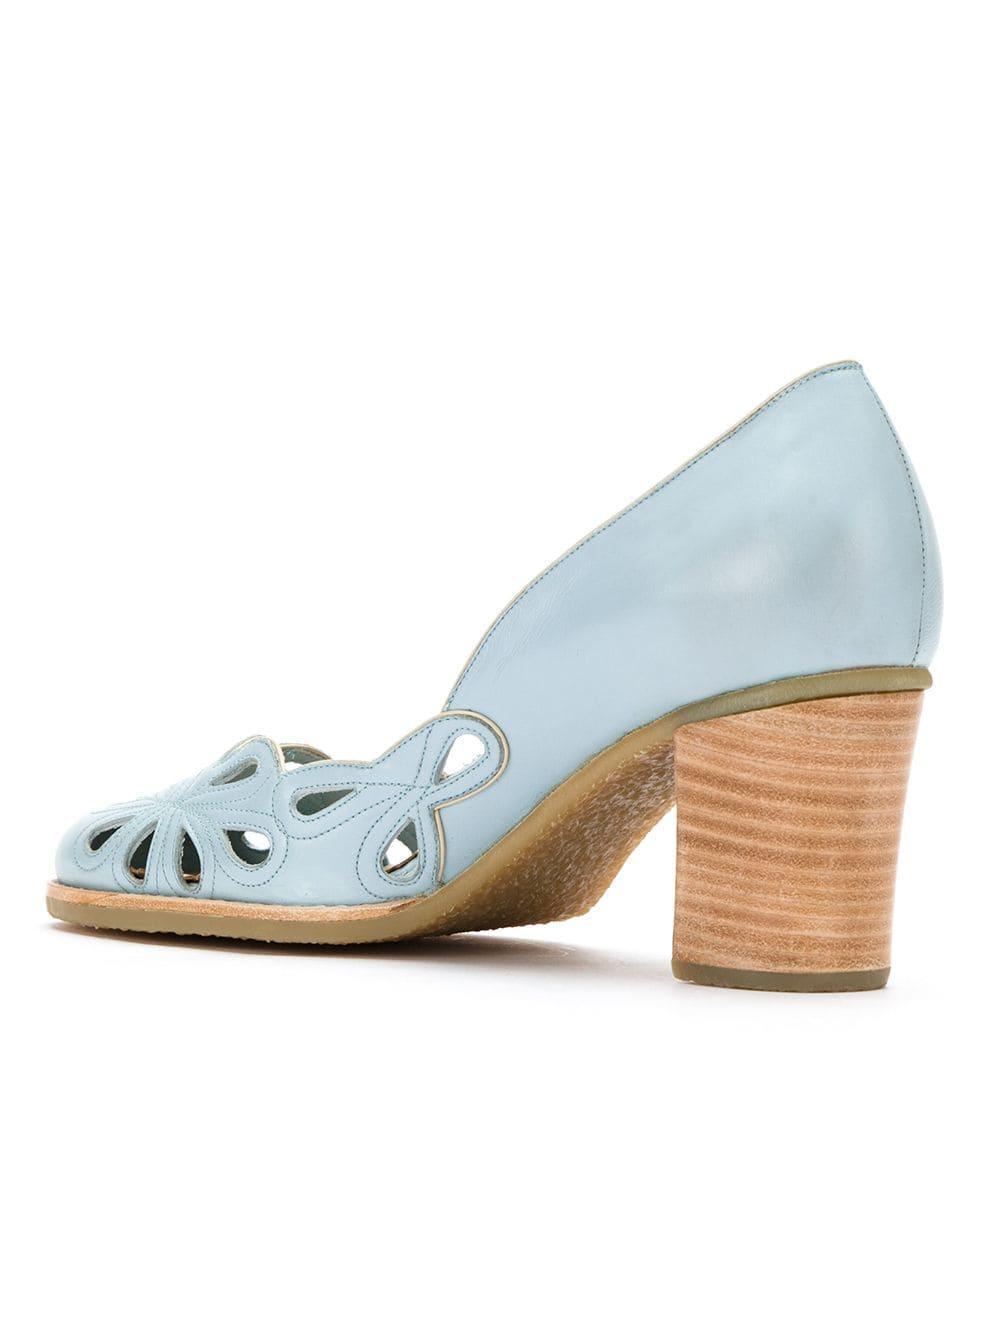 Zapatos de tacón con detalles de cortes Sarah Chofakian de Cuero de color Azul